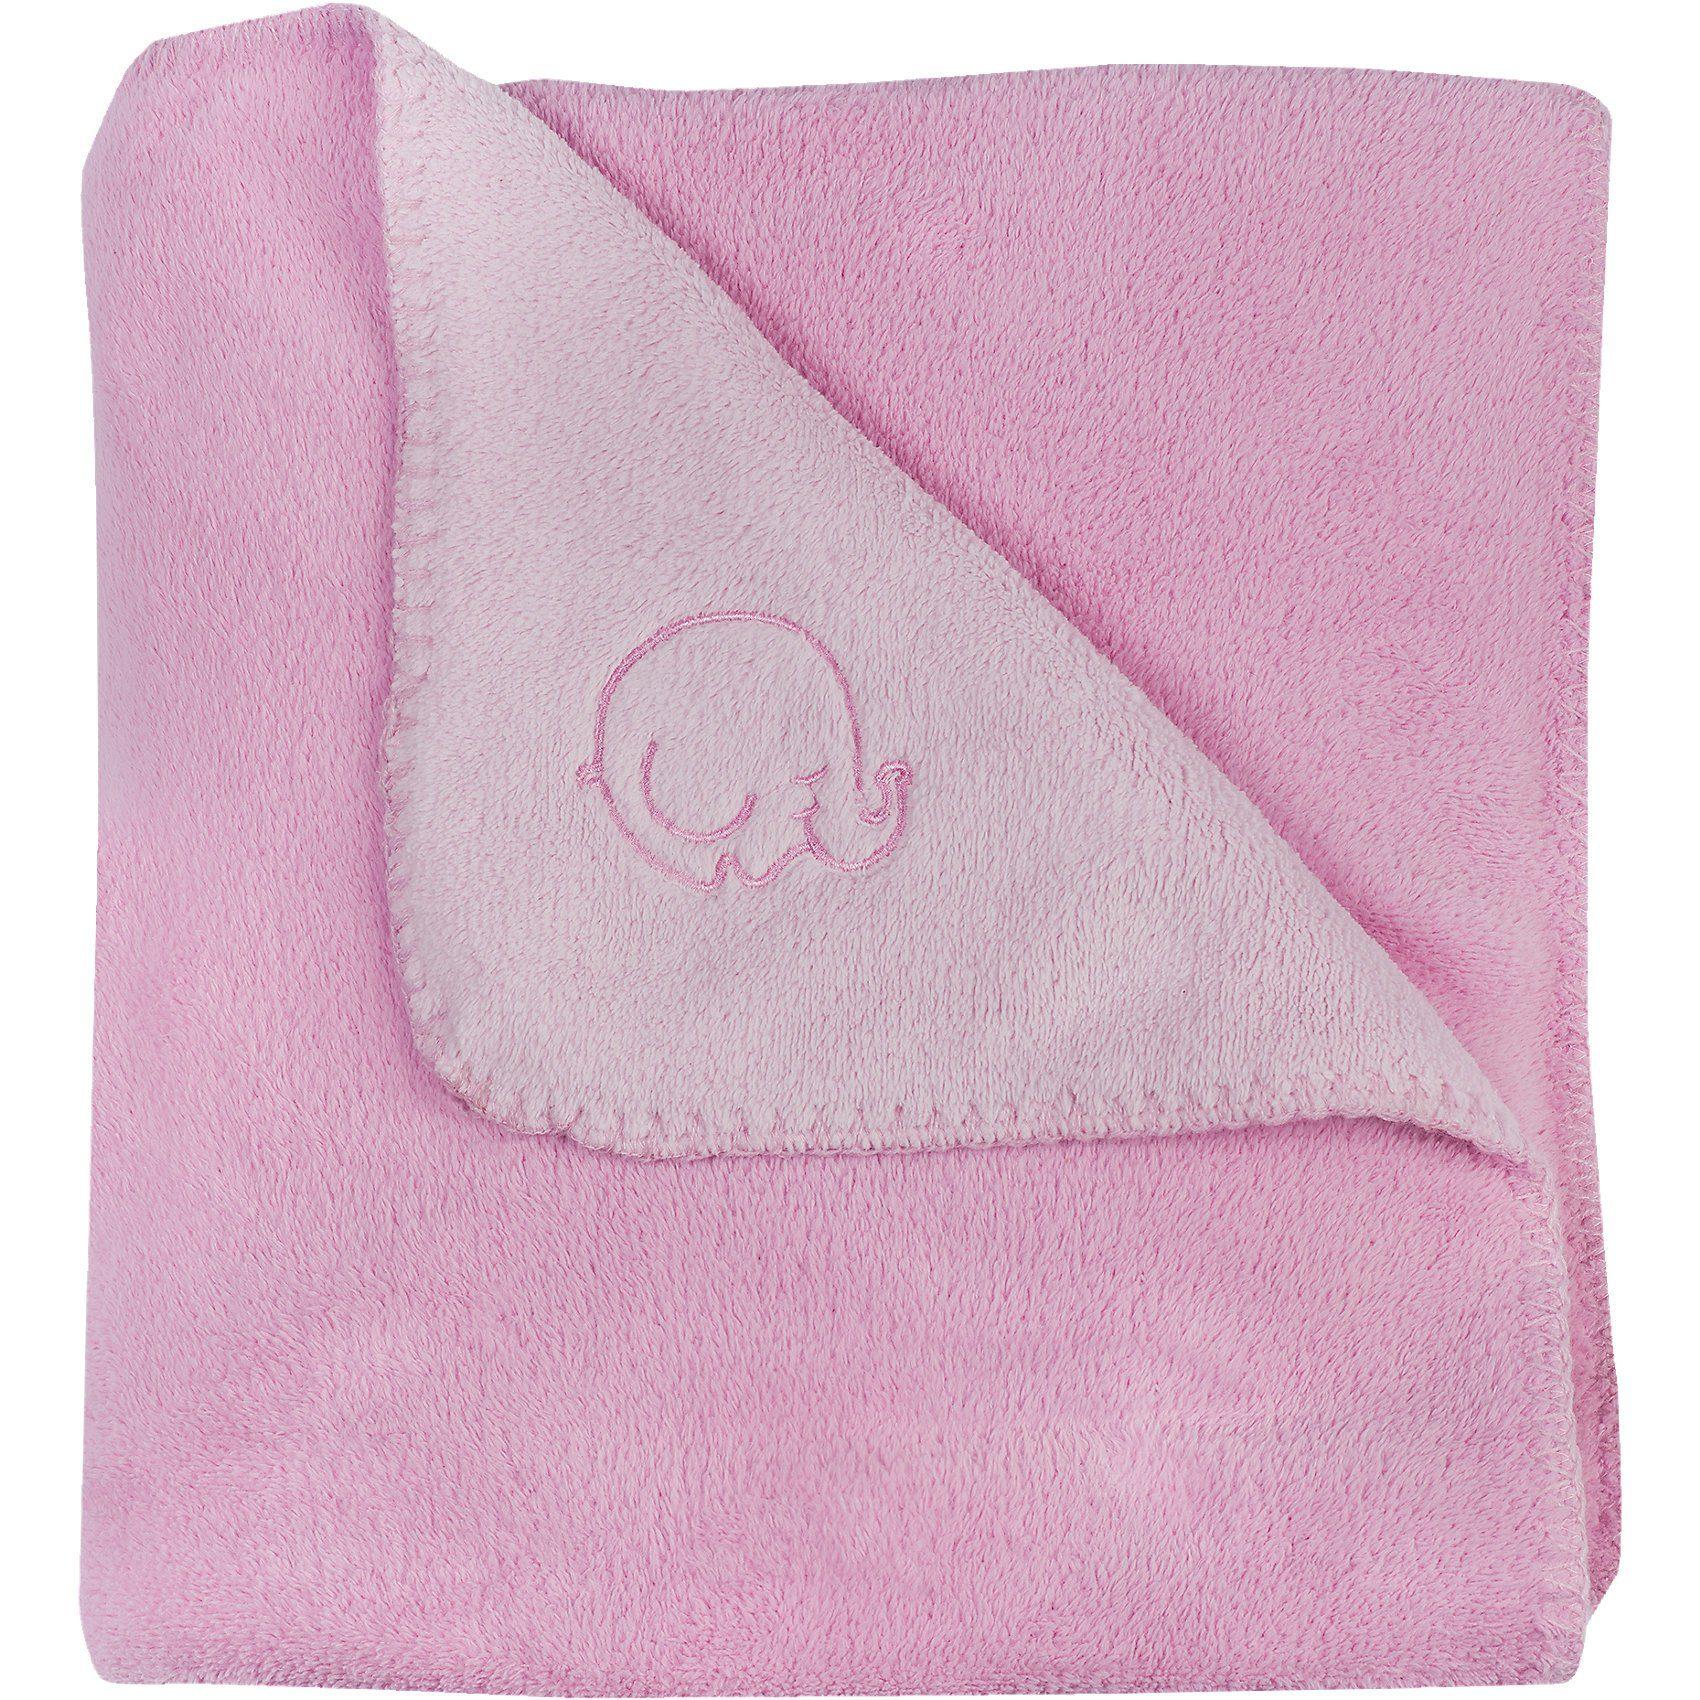 Jollein Babydecke Fleece, Comfy, rosa, 75 x 100 cm